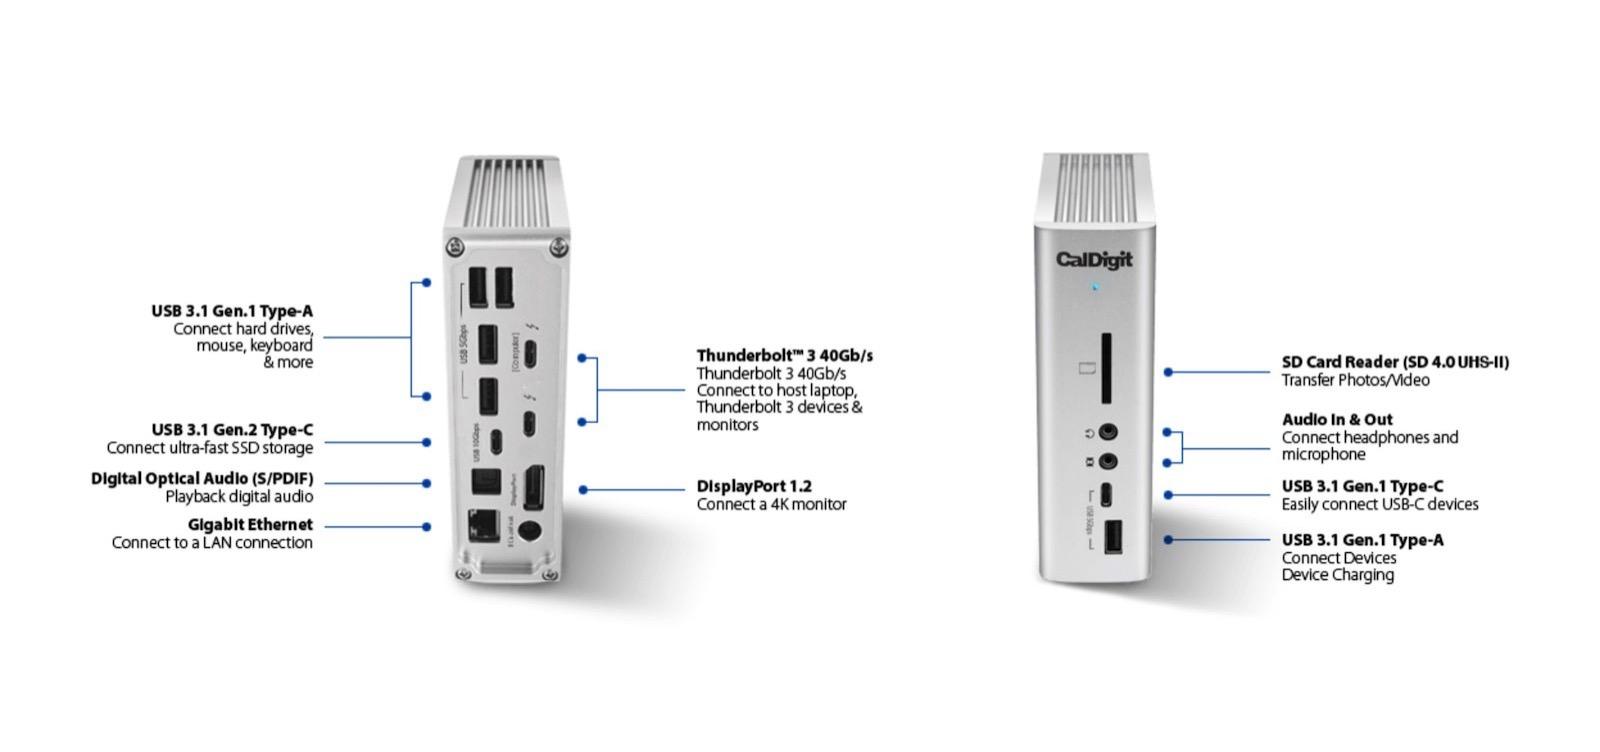 Caldigit-TS3-Plus-Ports.jpg